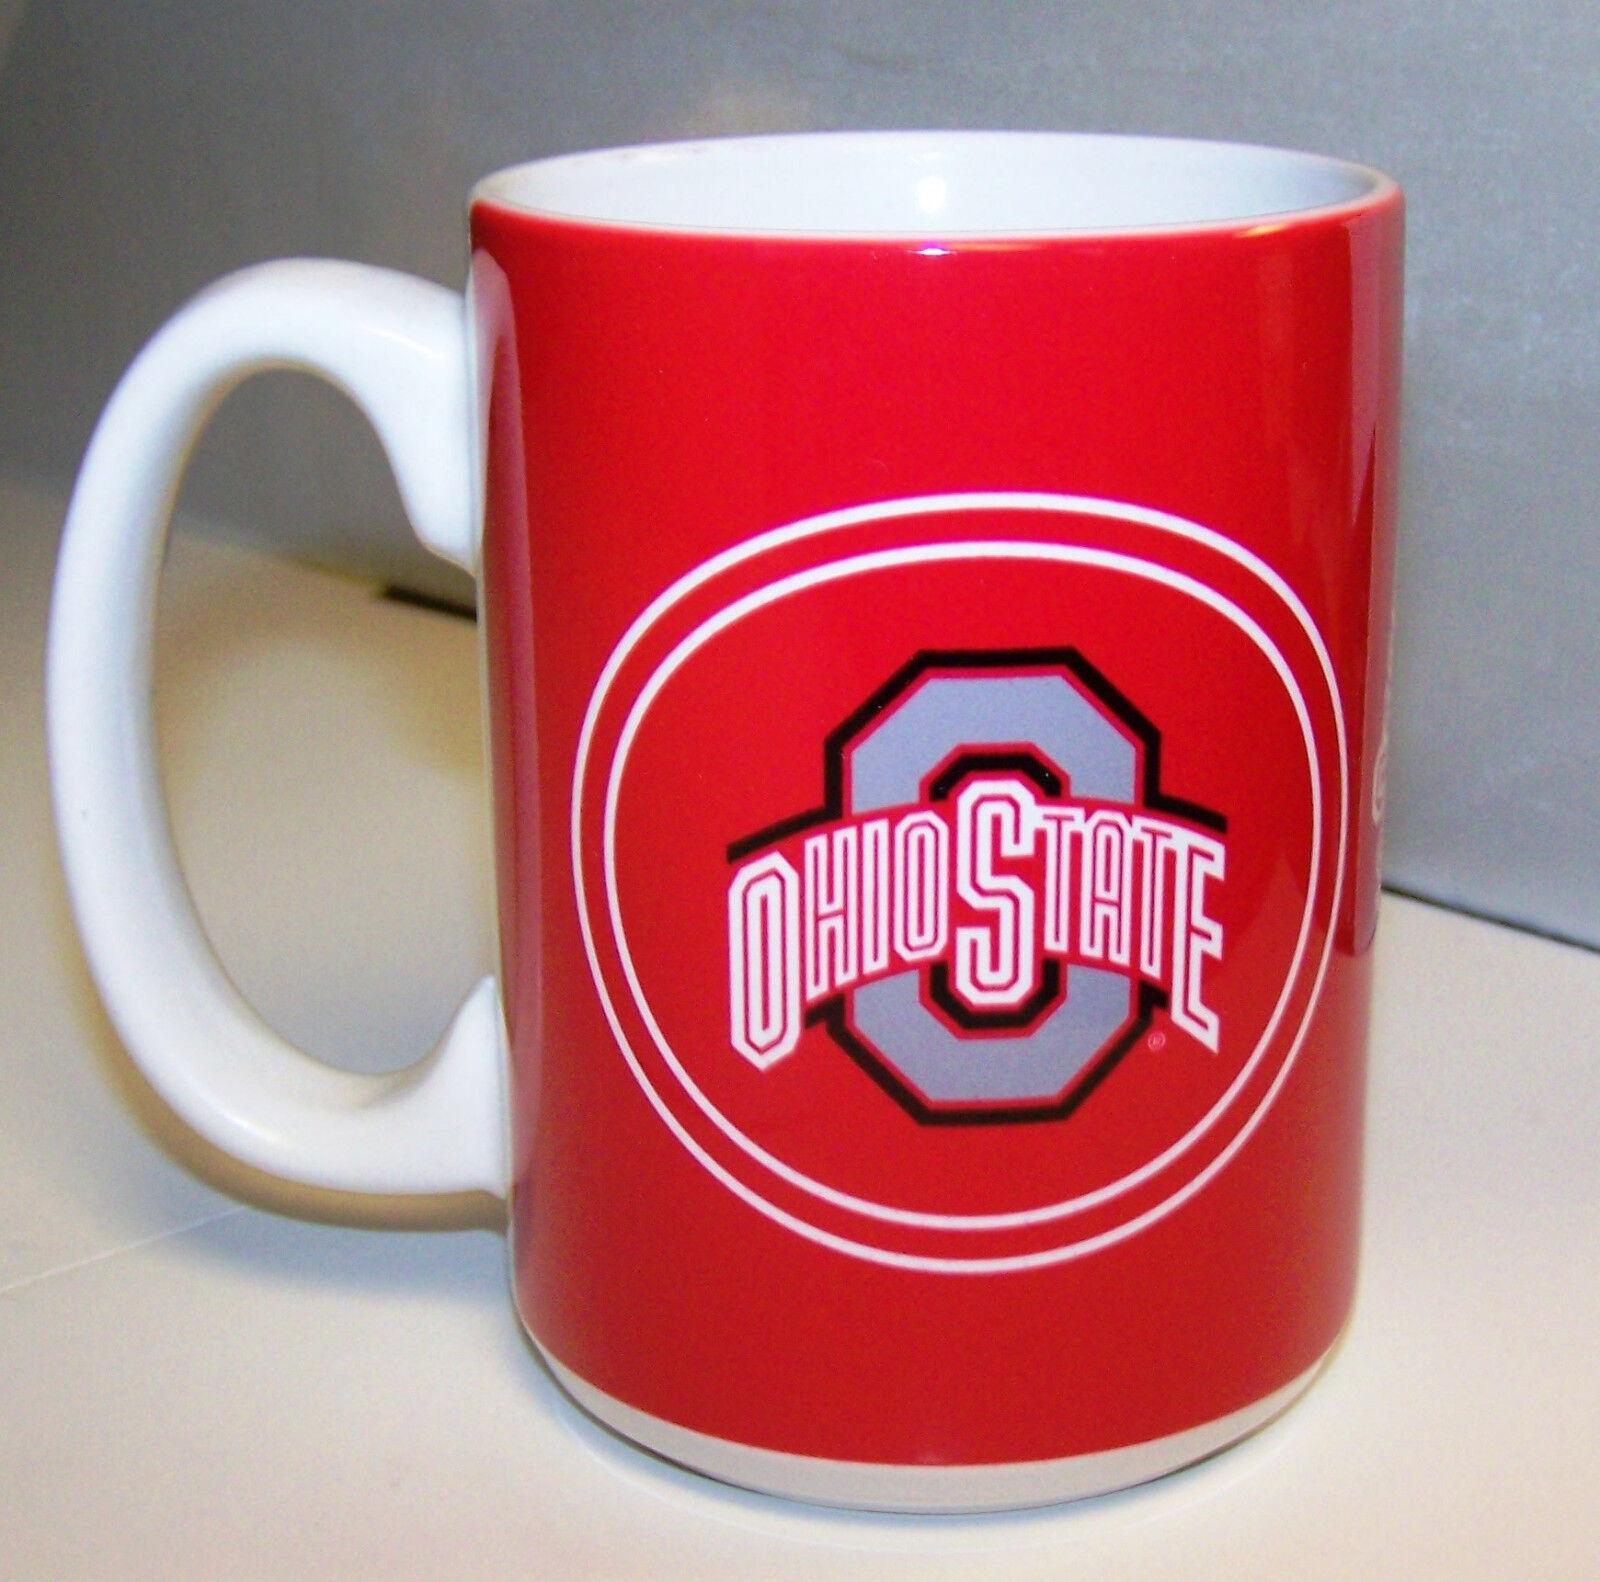 warm up style Mug Coffee Cup 1 Ohio State Buckeyes OSU NCAA 14 oz